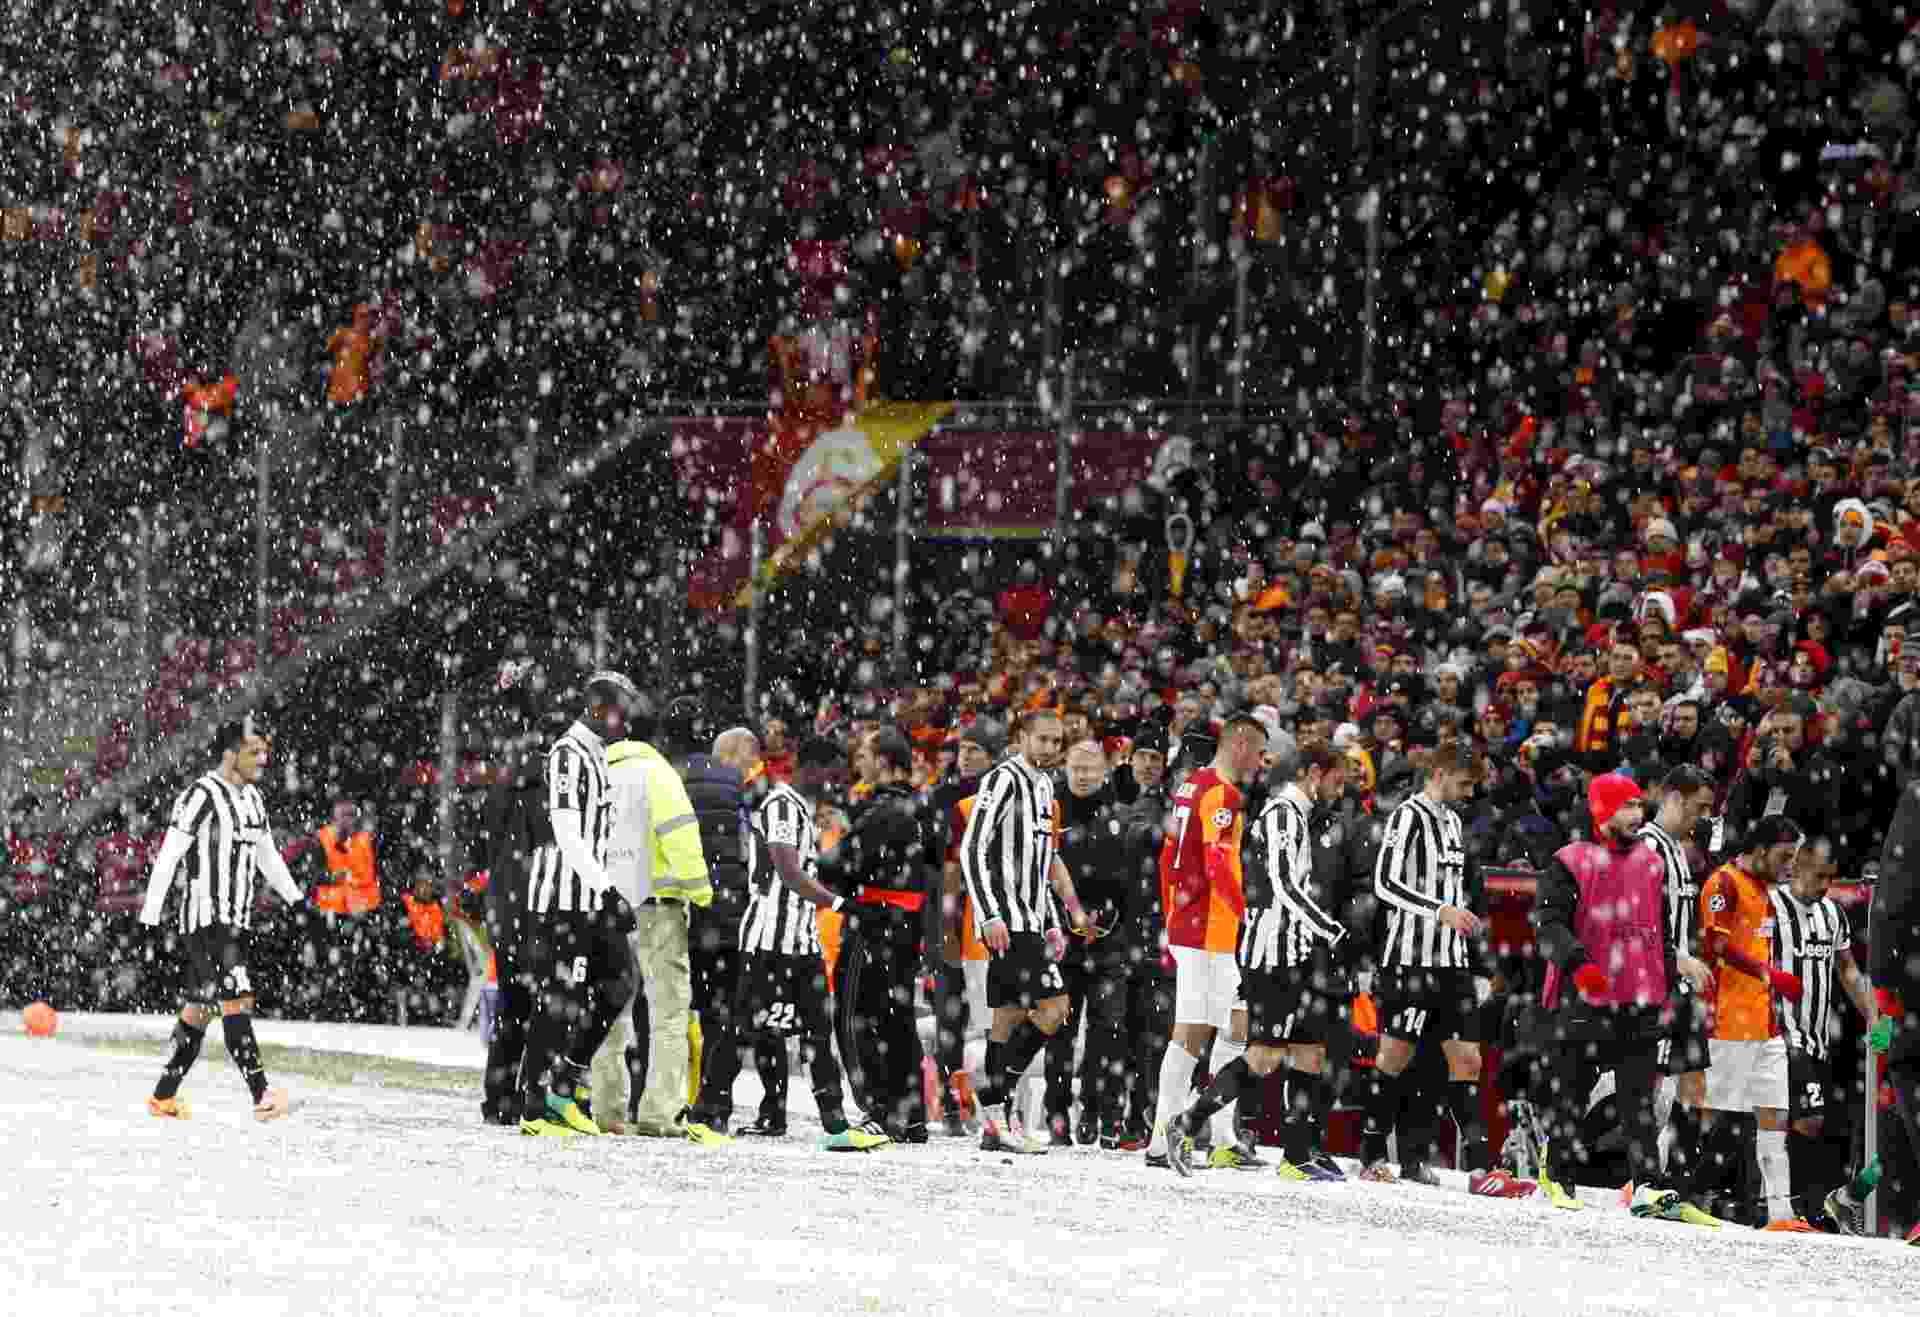 10.dez.2013 - Neve toma conta do gramado durante a partida entre Galatasaray e Juventus em Istambul. A partida foi adiada. - REUTERS/Osman Orsal